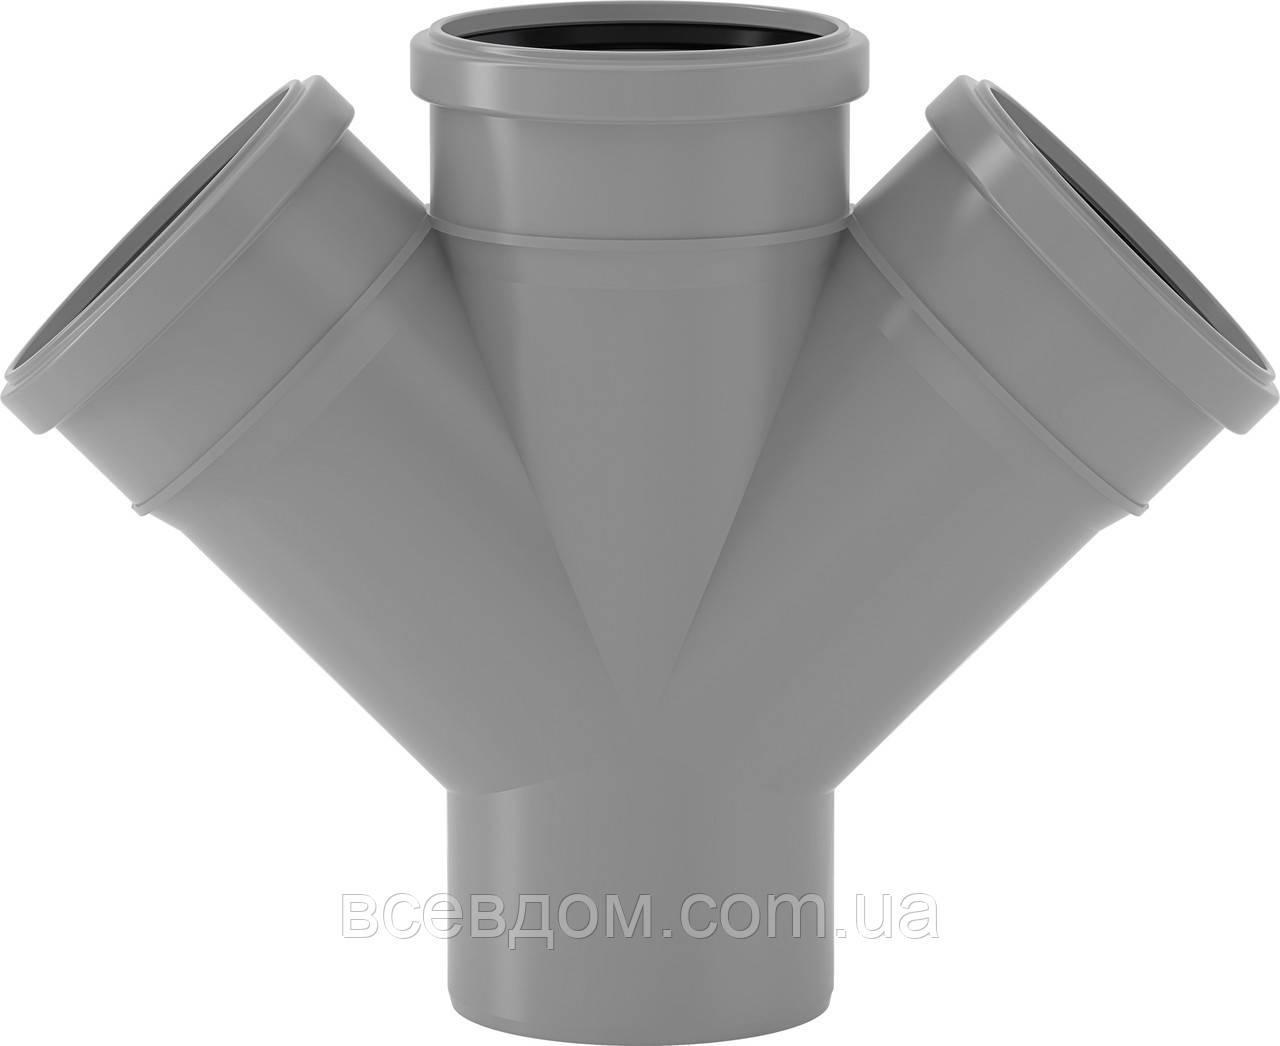 HDTA крестовина Valsir внутренней канализации 110/110/110х87°